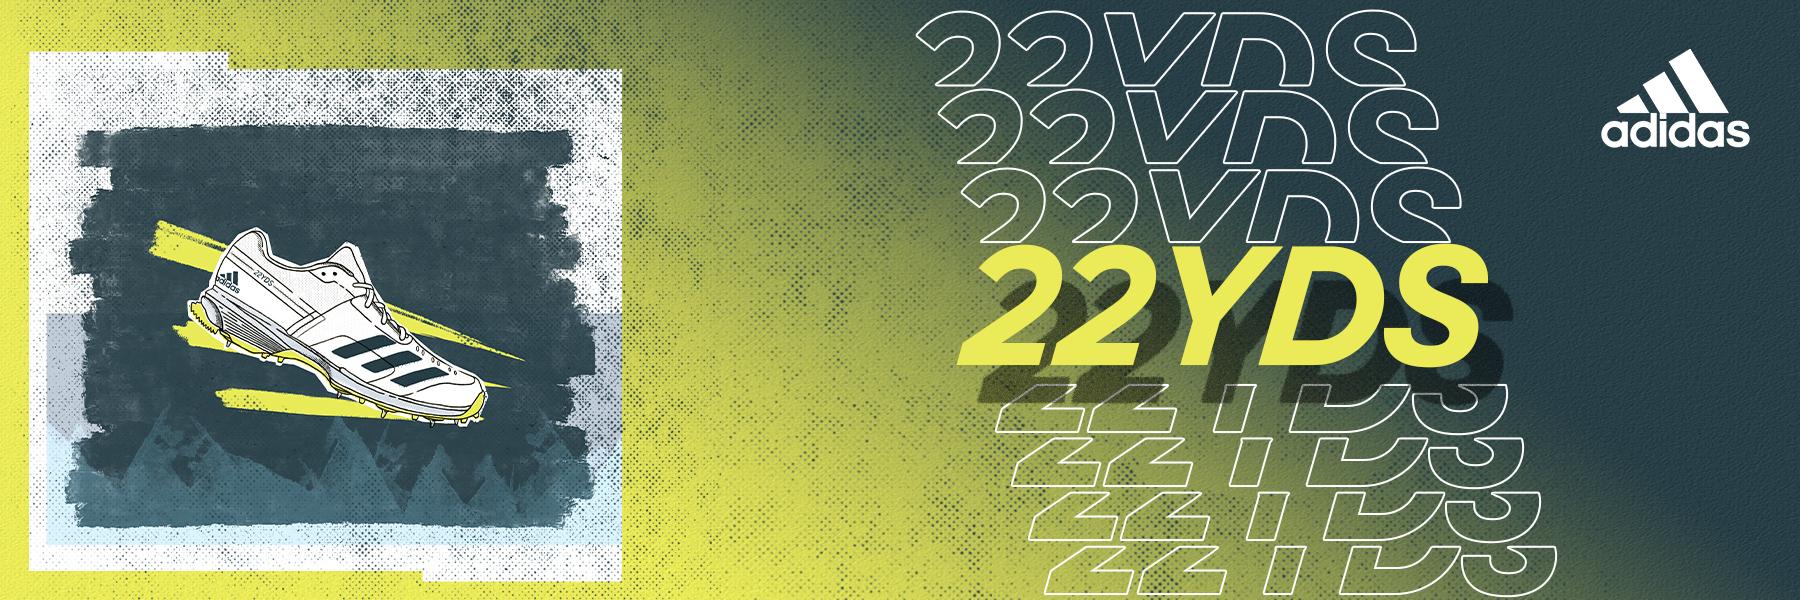 22yds